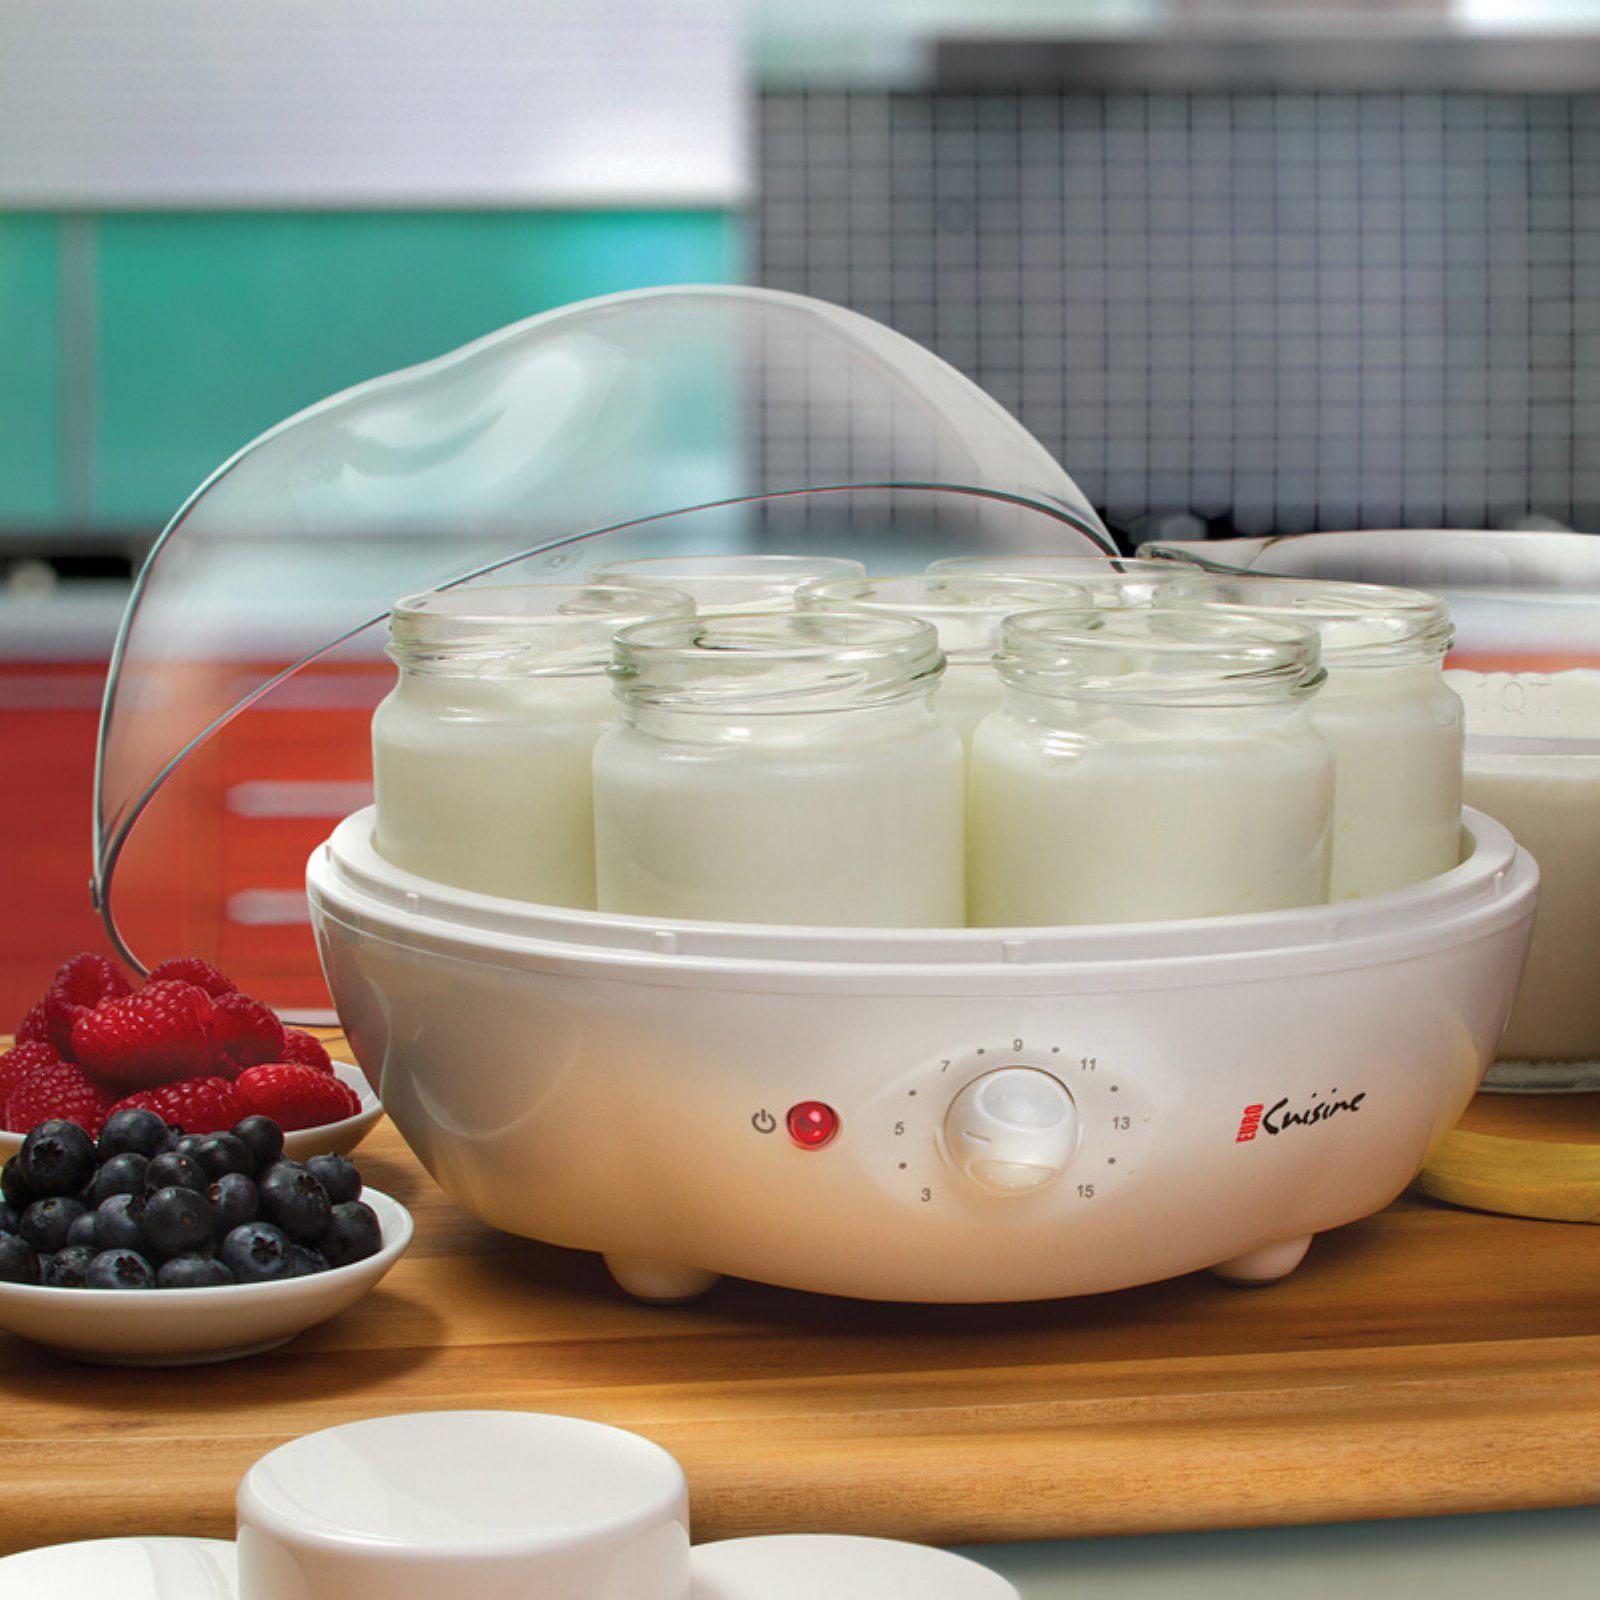 Euro Cuisine YM100 Automatic Yogurt Maker